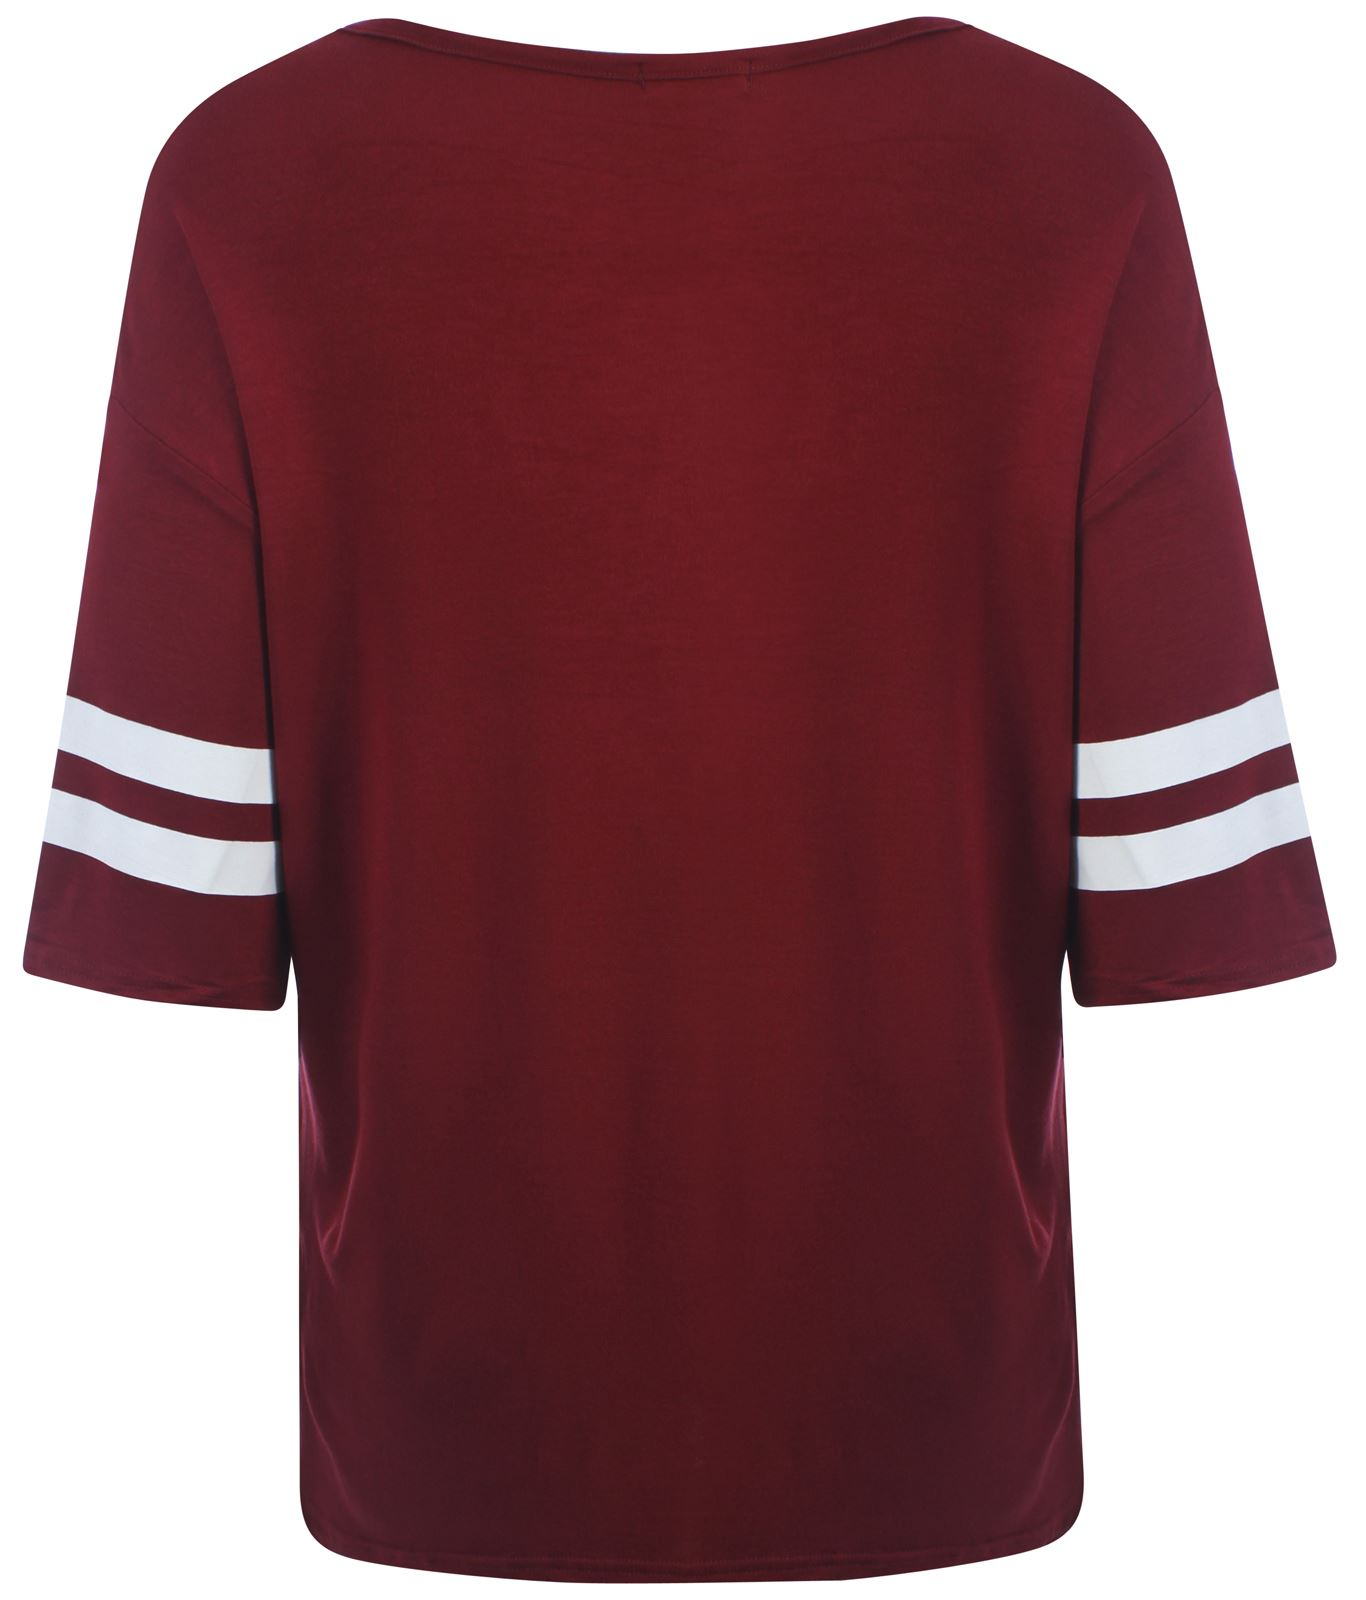 bdc1632988 New Womens Plus Size Varsity Stripe Baggy T-Shirts Oversize Tops 12-26